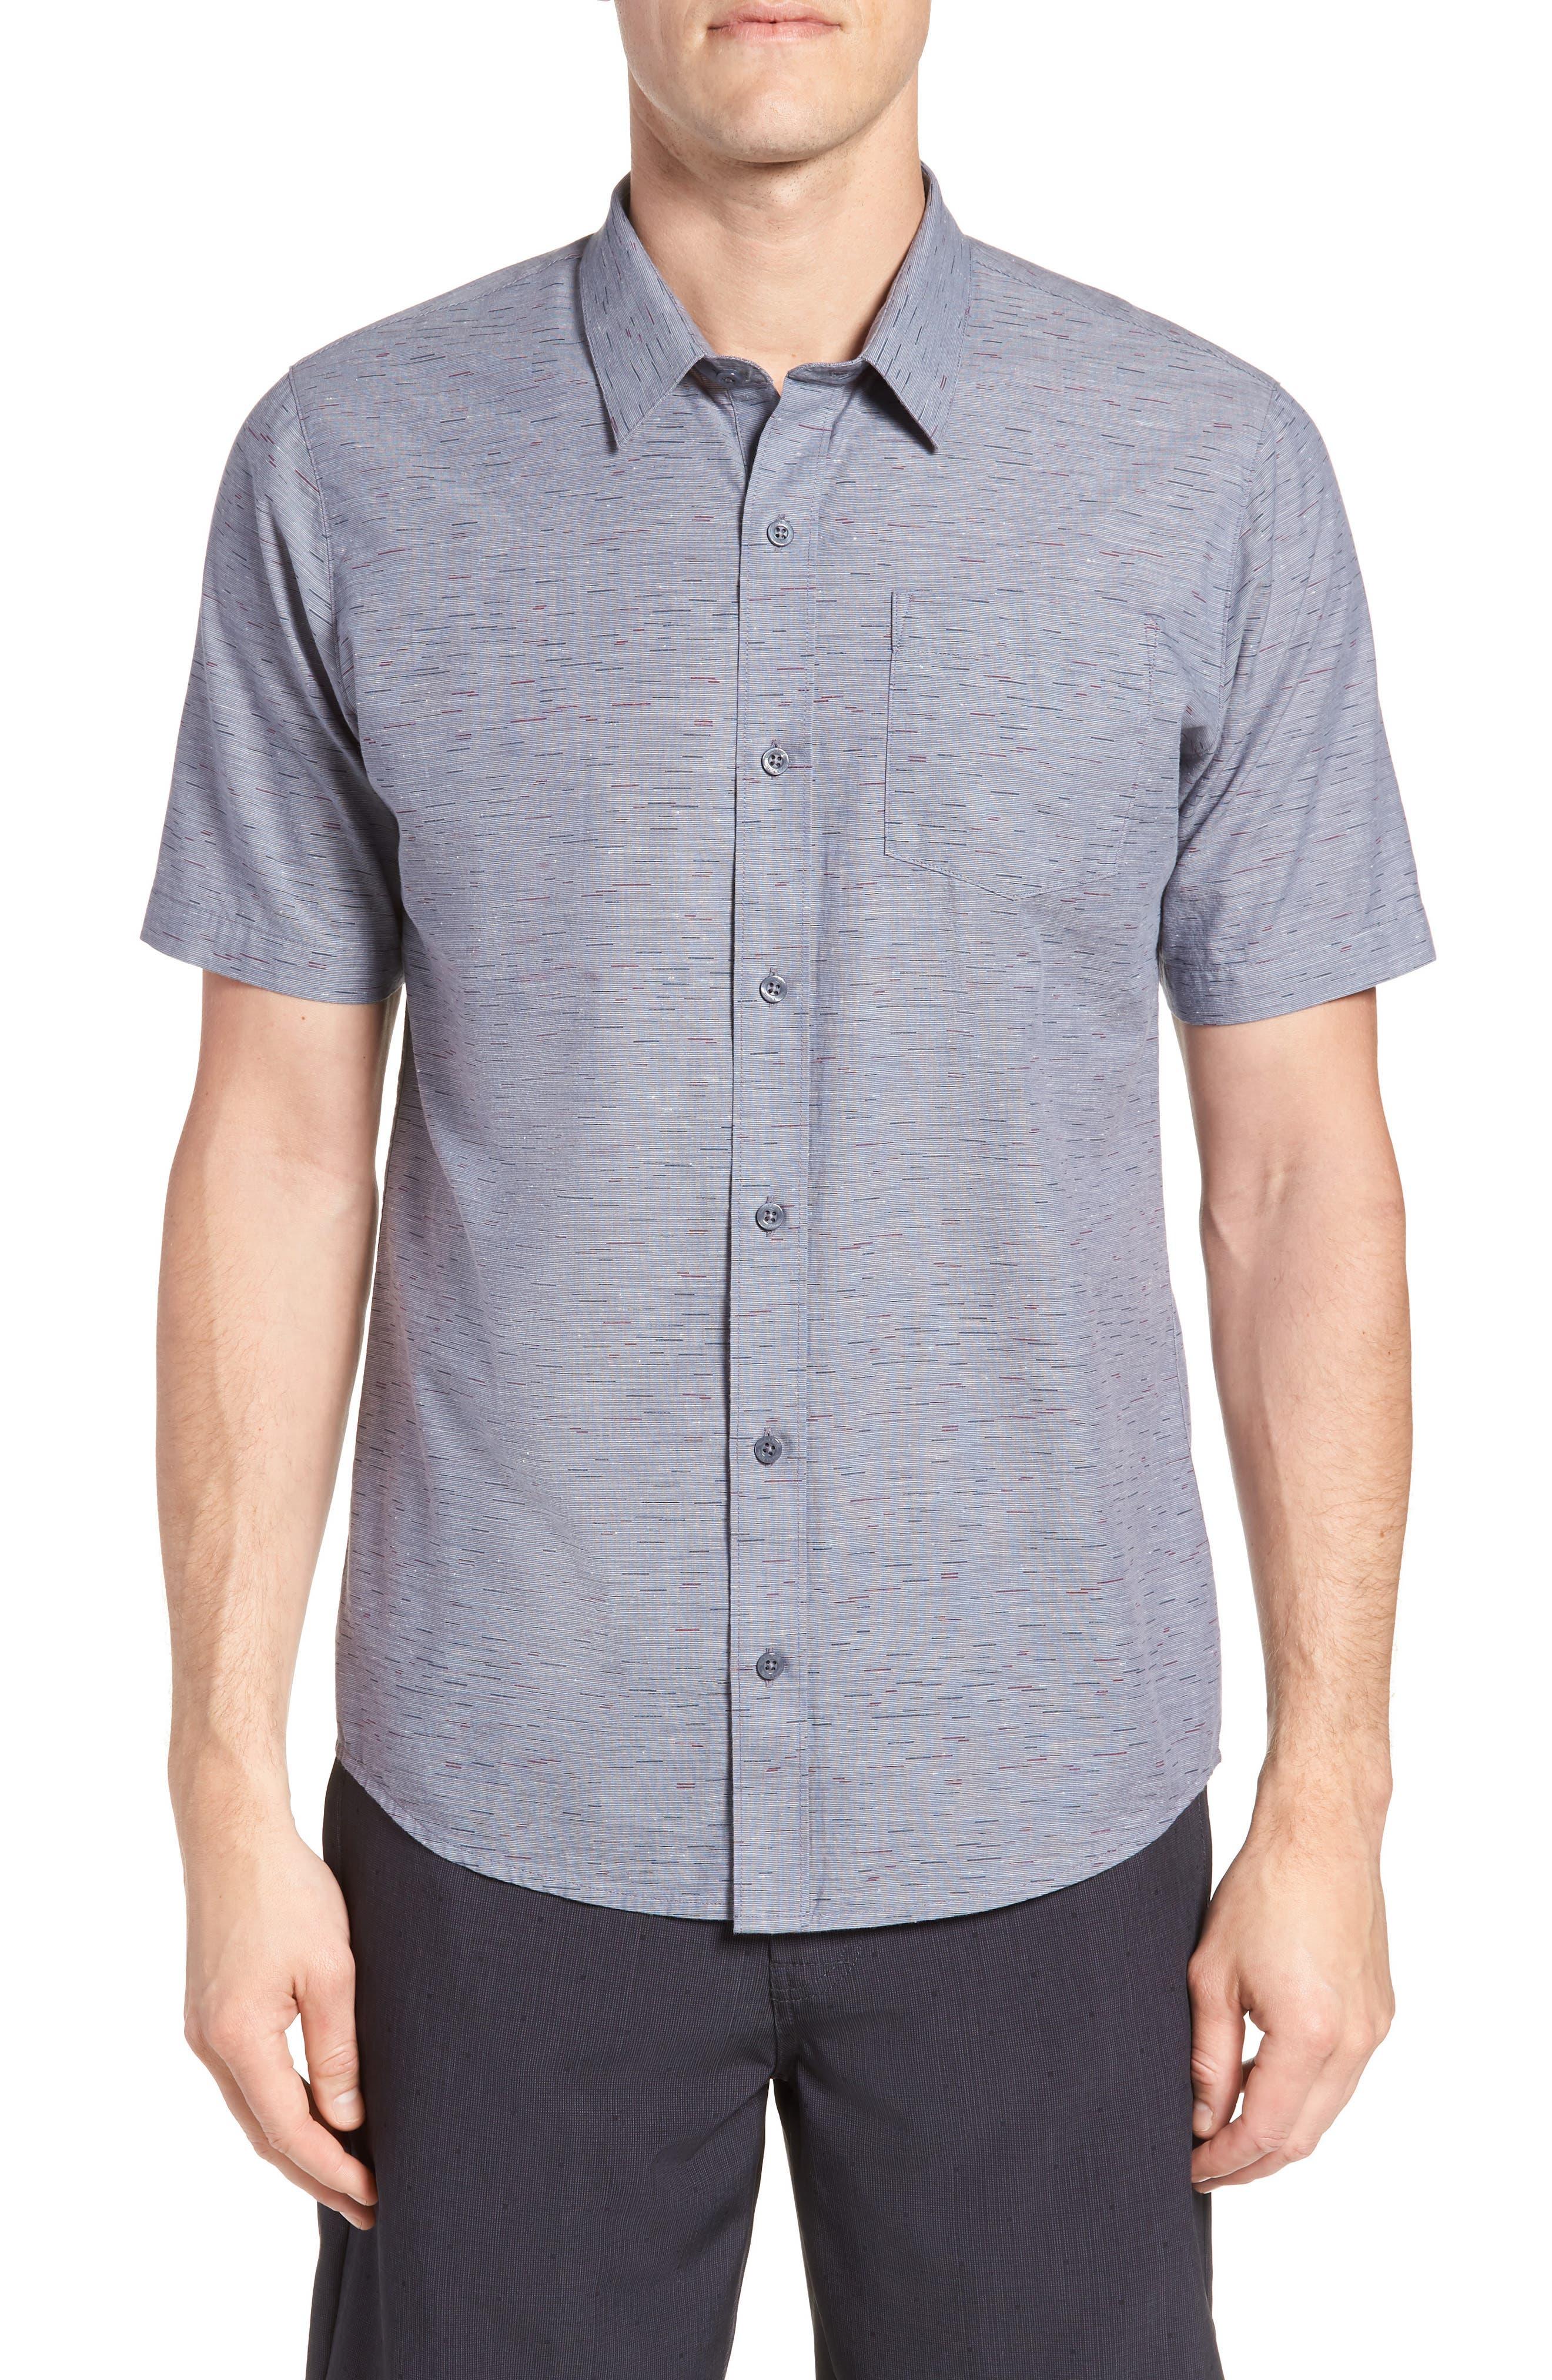 Stacoto Regular Fit Sport Shirt,                         Main,                         color, Heather Alloy